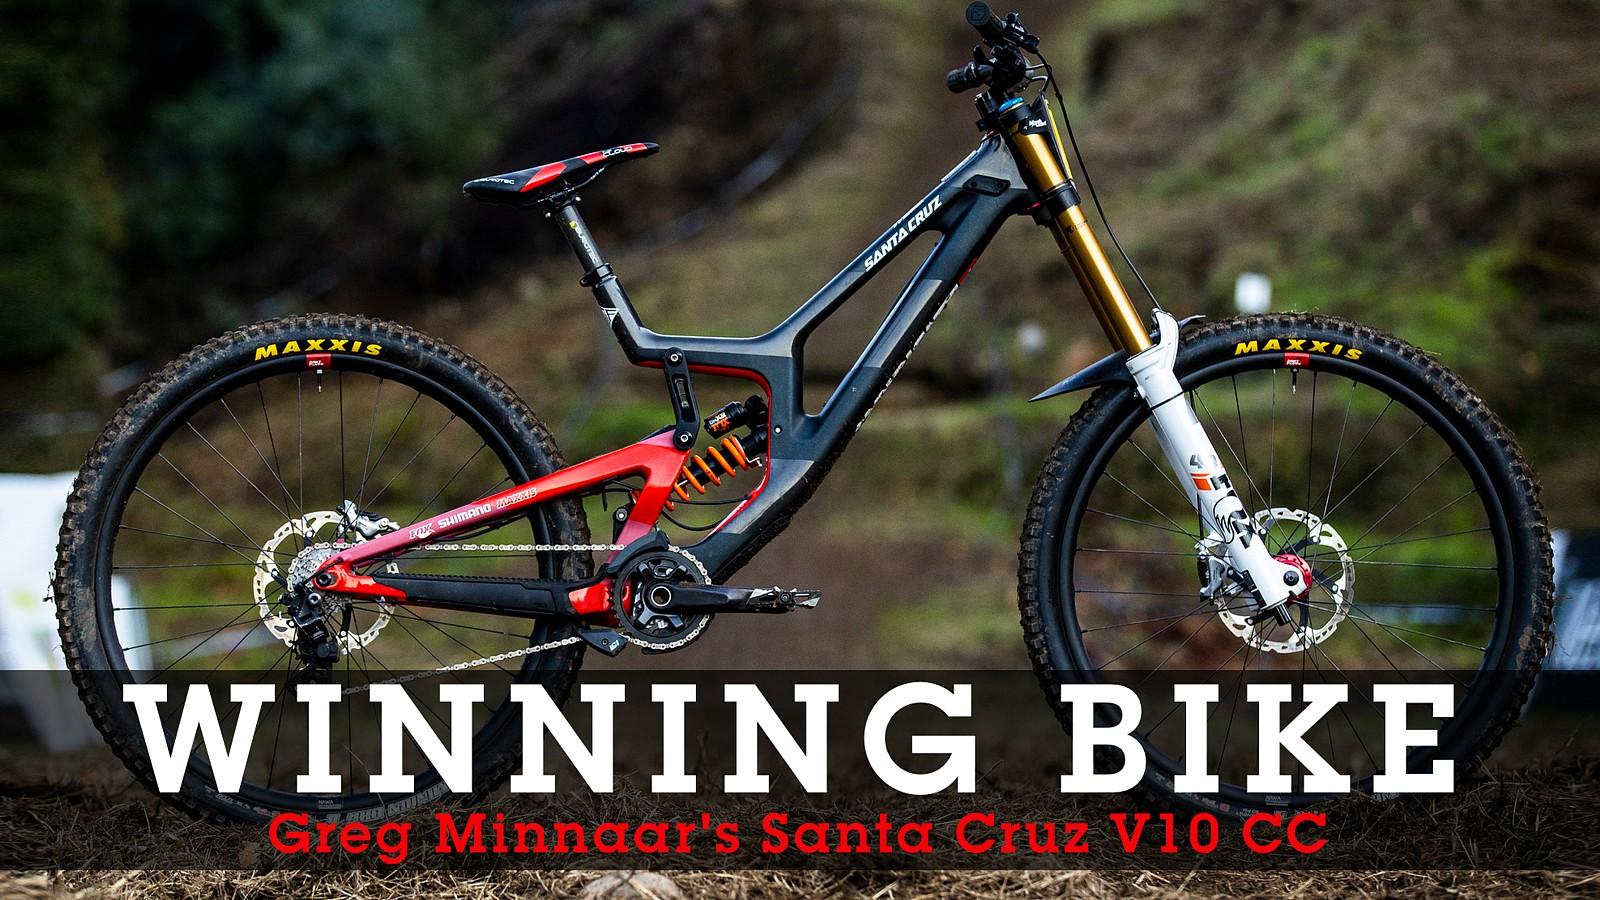 WINNING BIKE: Greg Minnaar's Santa Cruz V10 - WINNING BIKE: Greg Minnaar's Santa Cruz V10 - Mountain Biking Pictures - Vital MTB